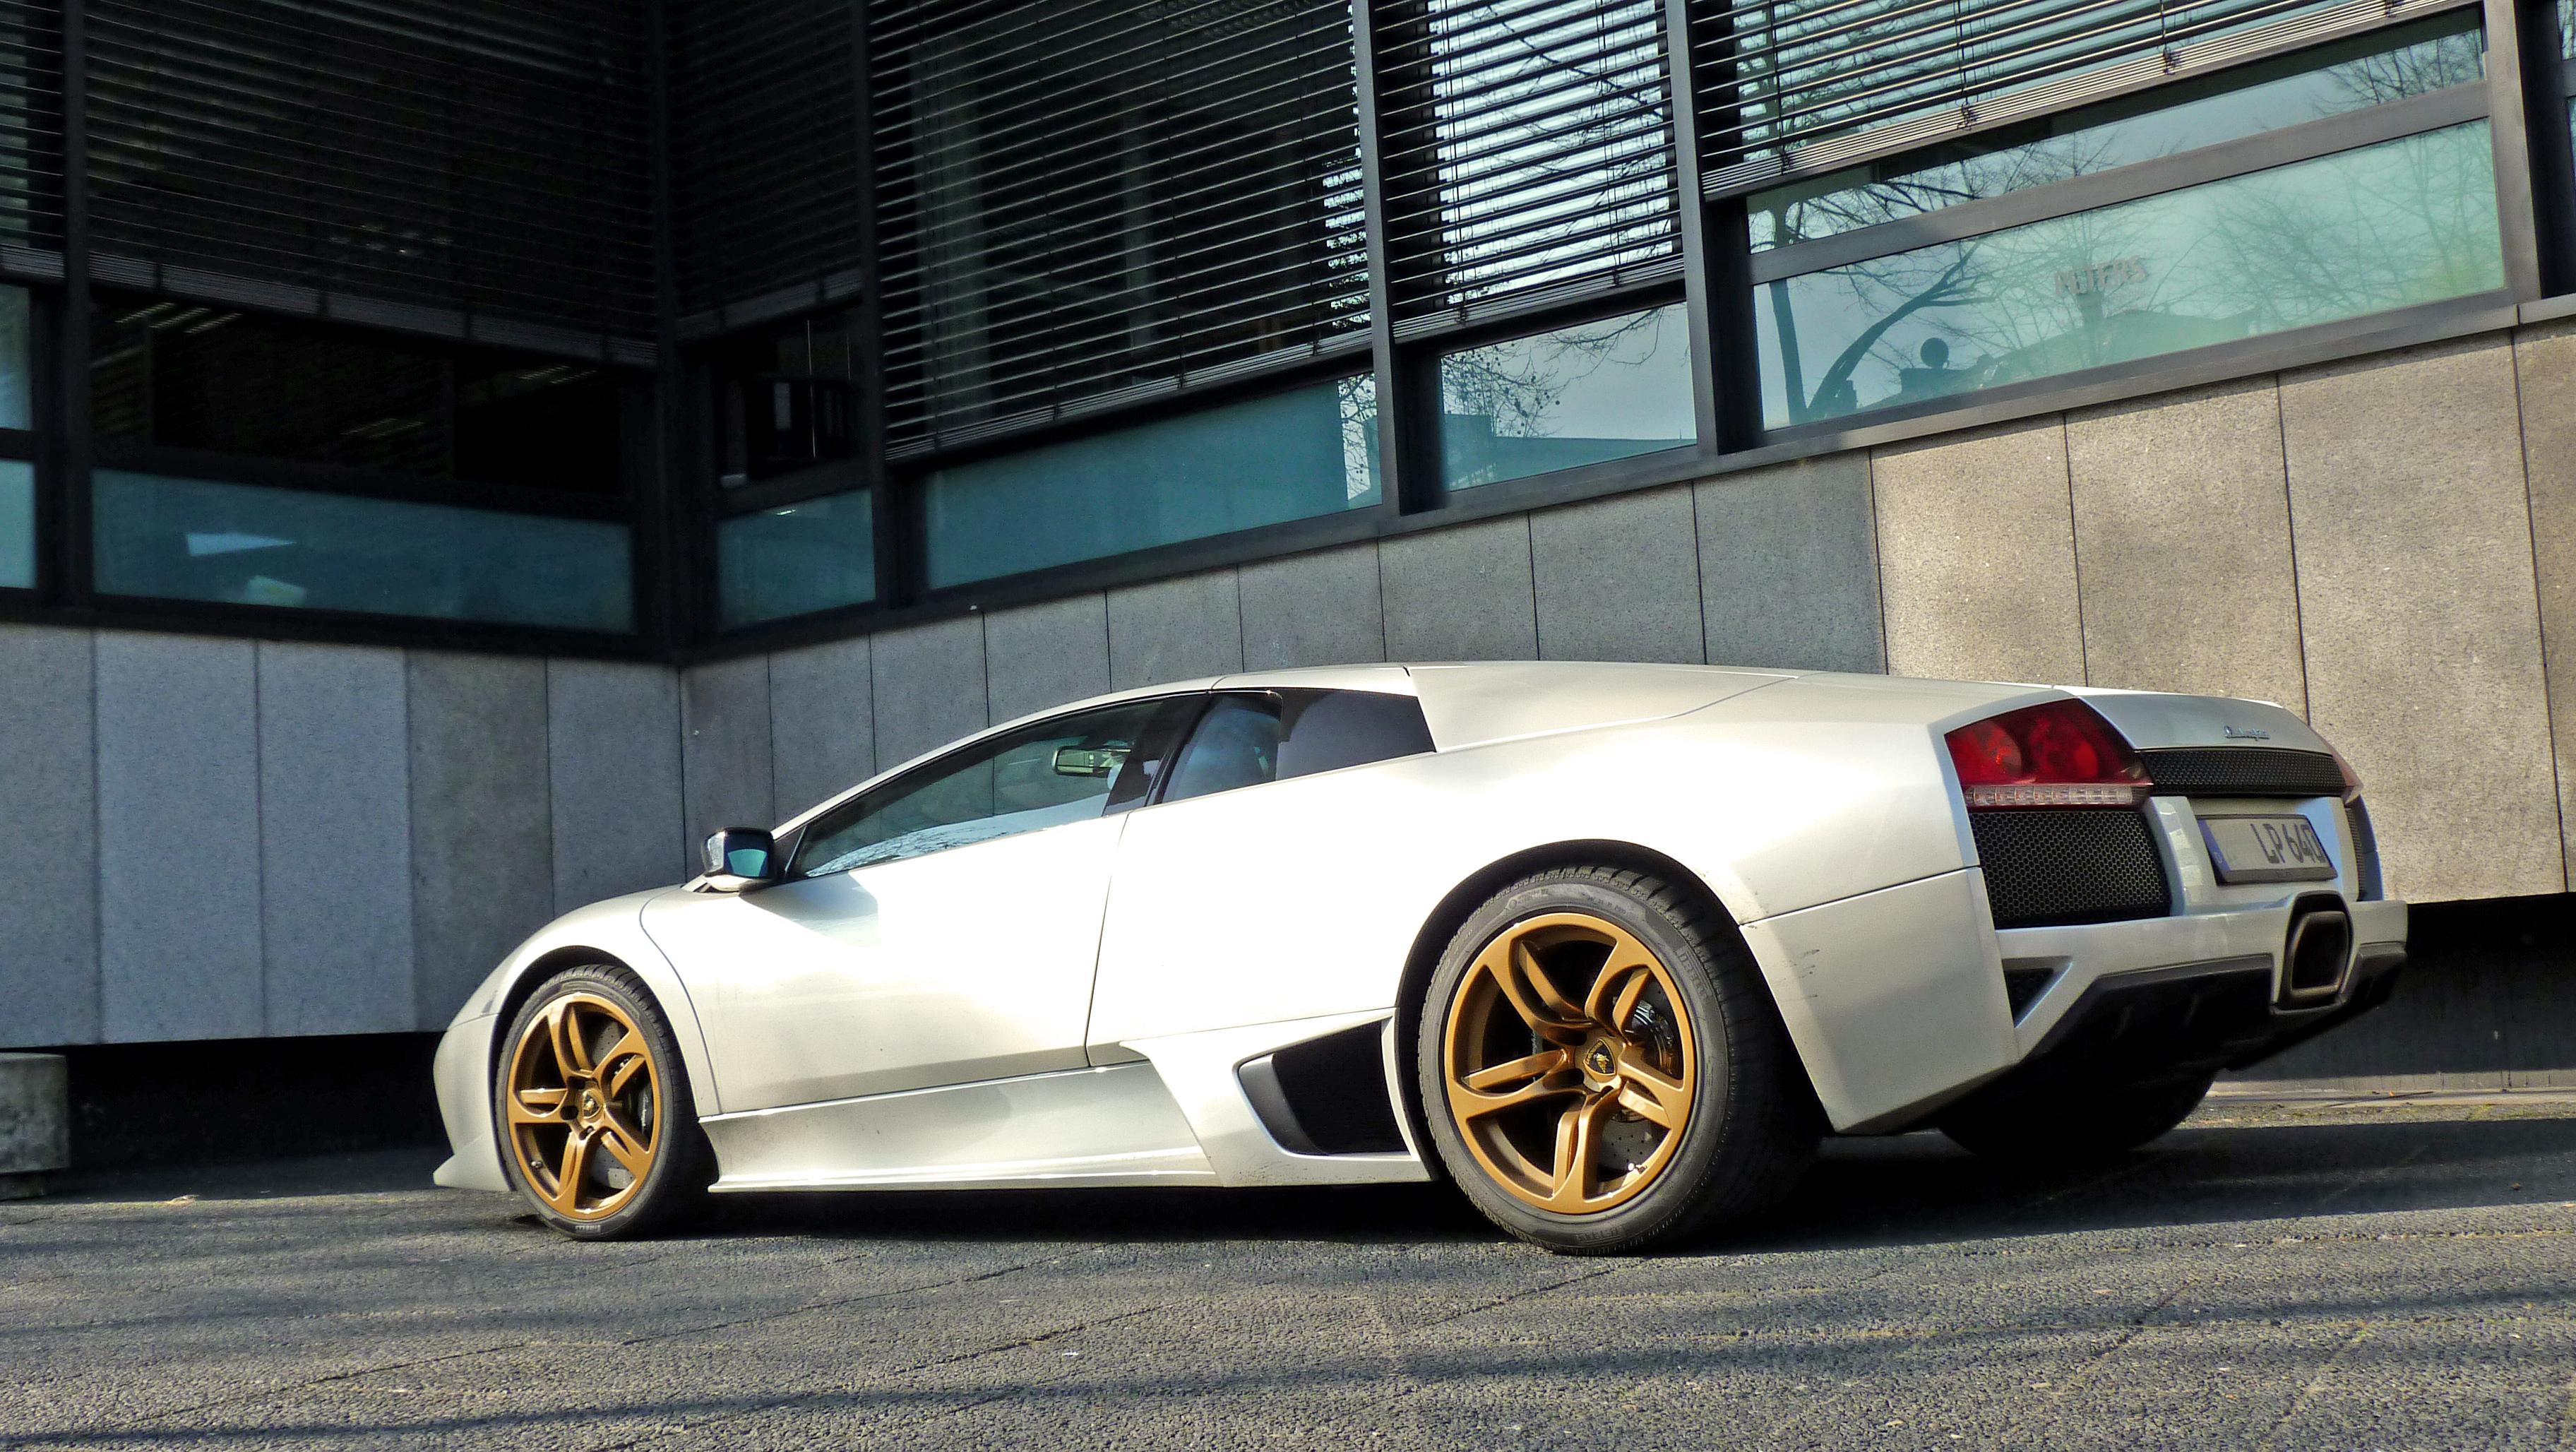 Wallpaper White Lamborghini Aventador Gold Gallardo Sports Car Murcielago Performance Reventon Bielefeld